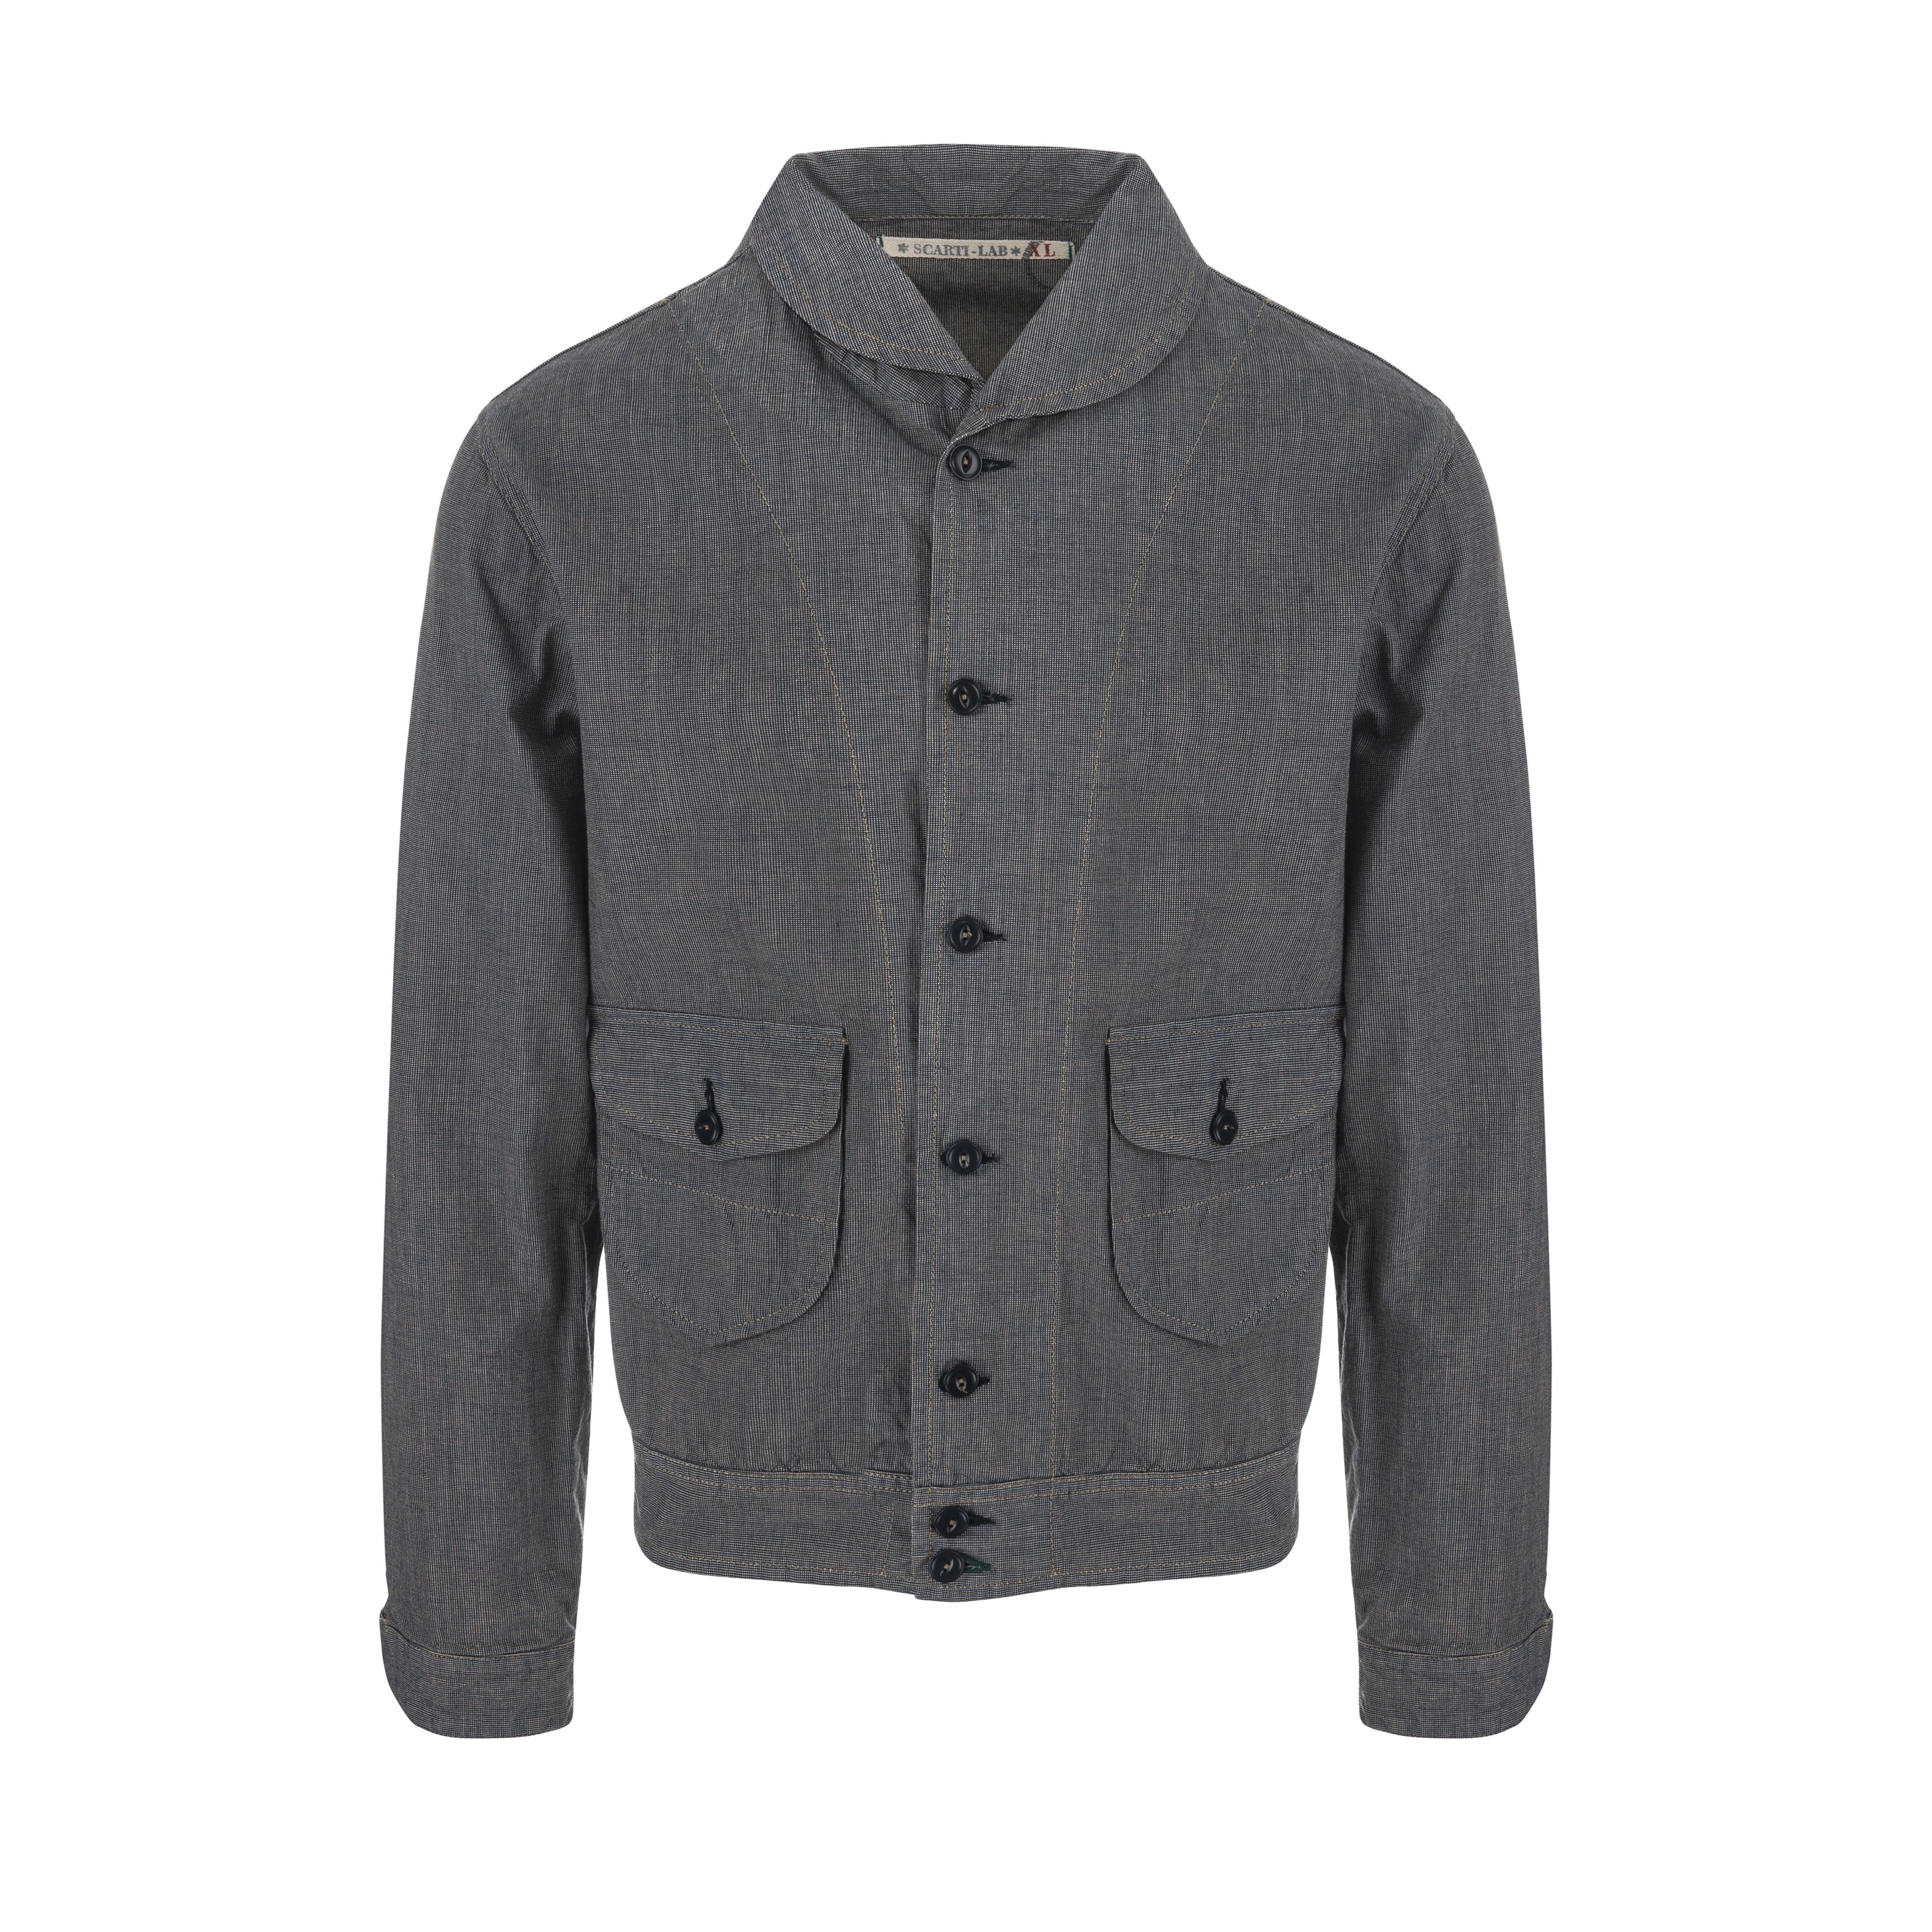 Cotton Jacket Blue/Grey